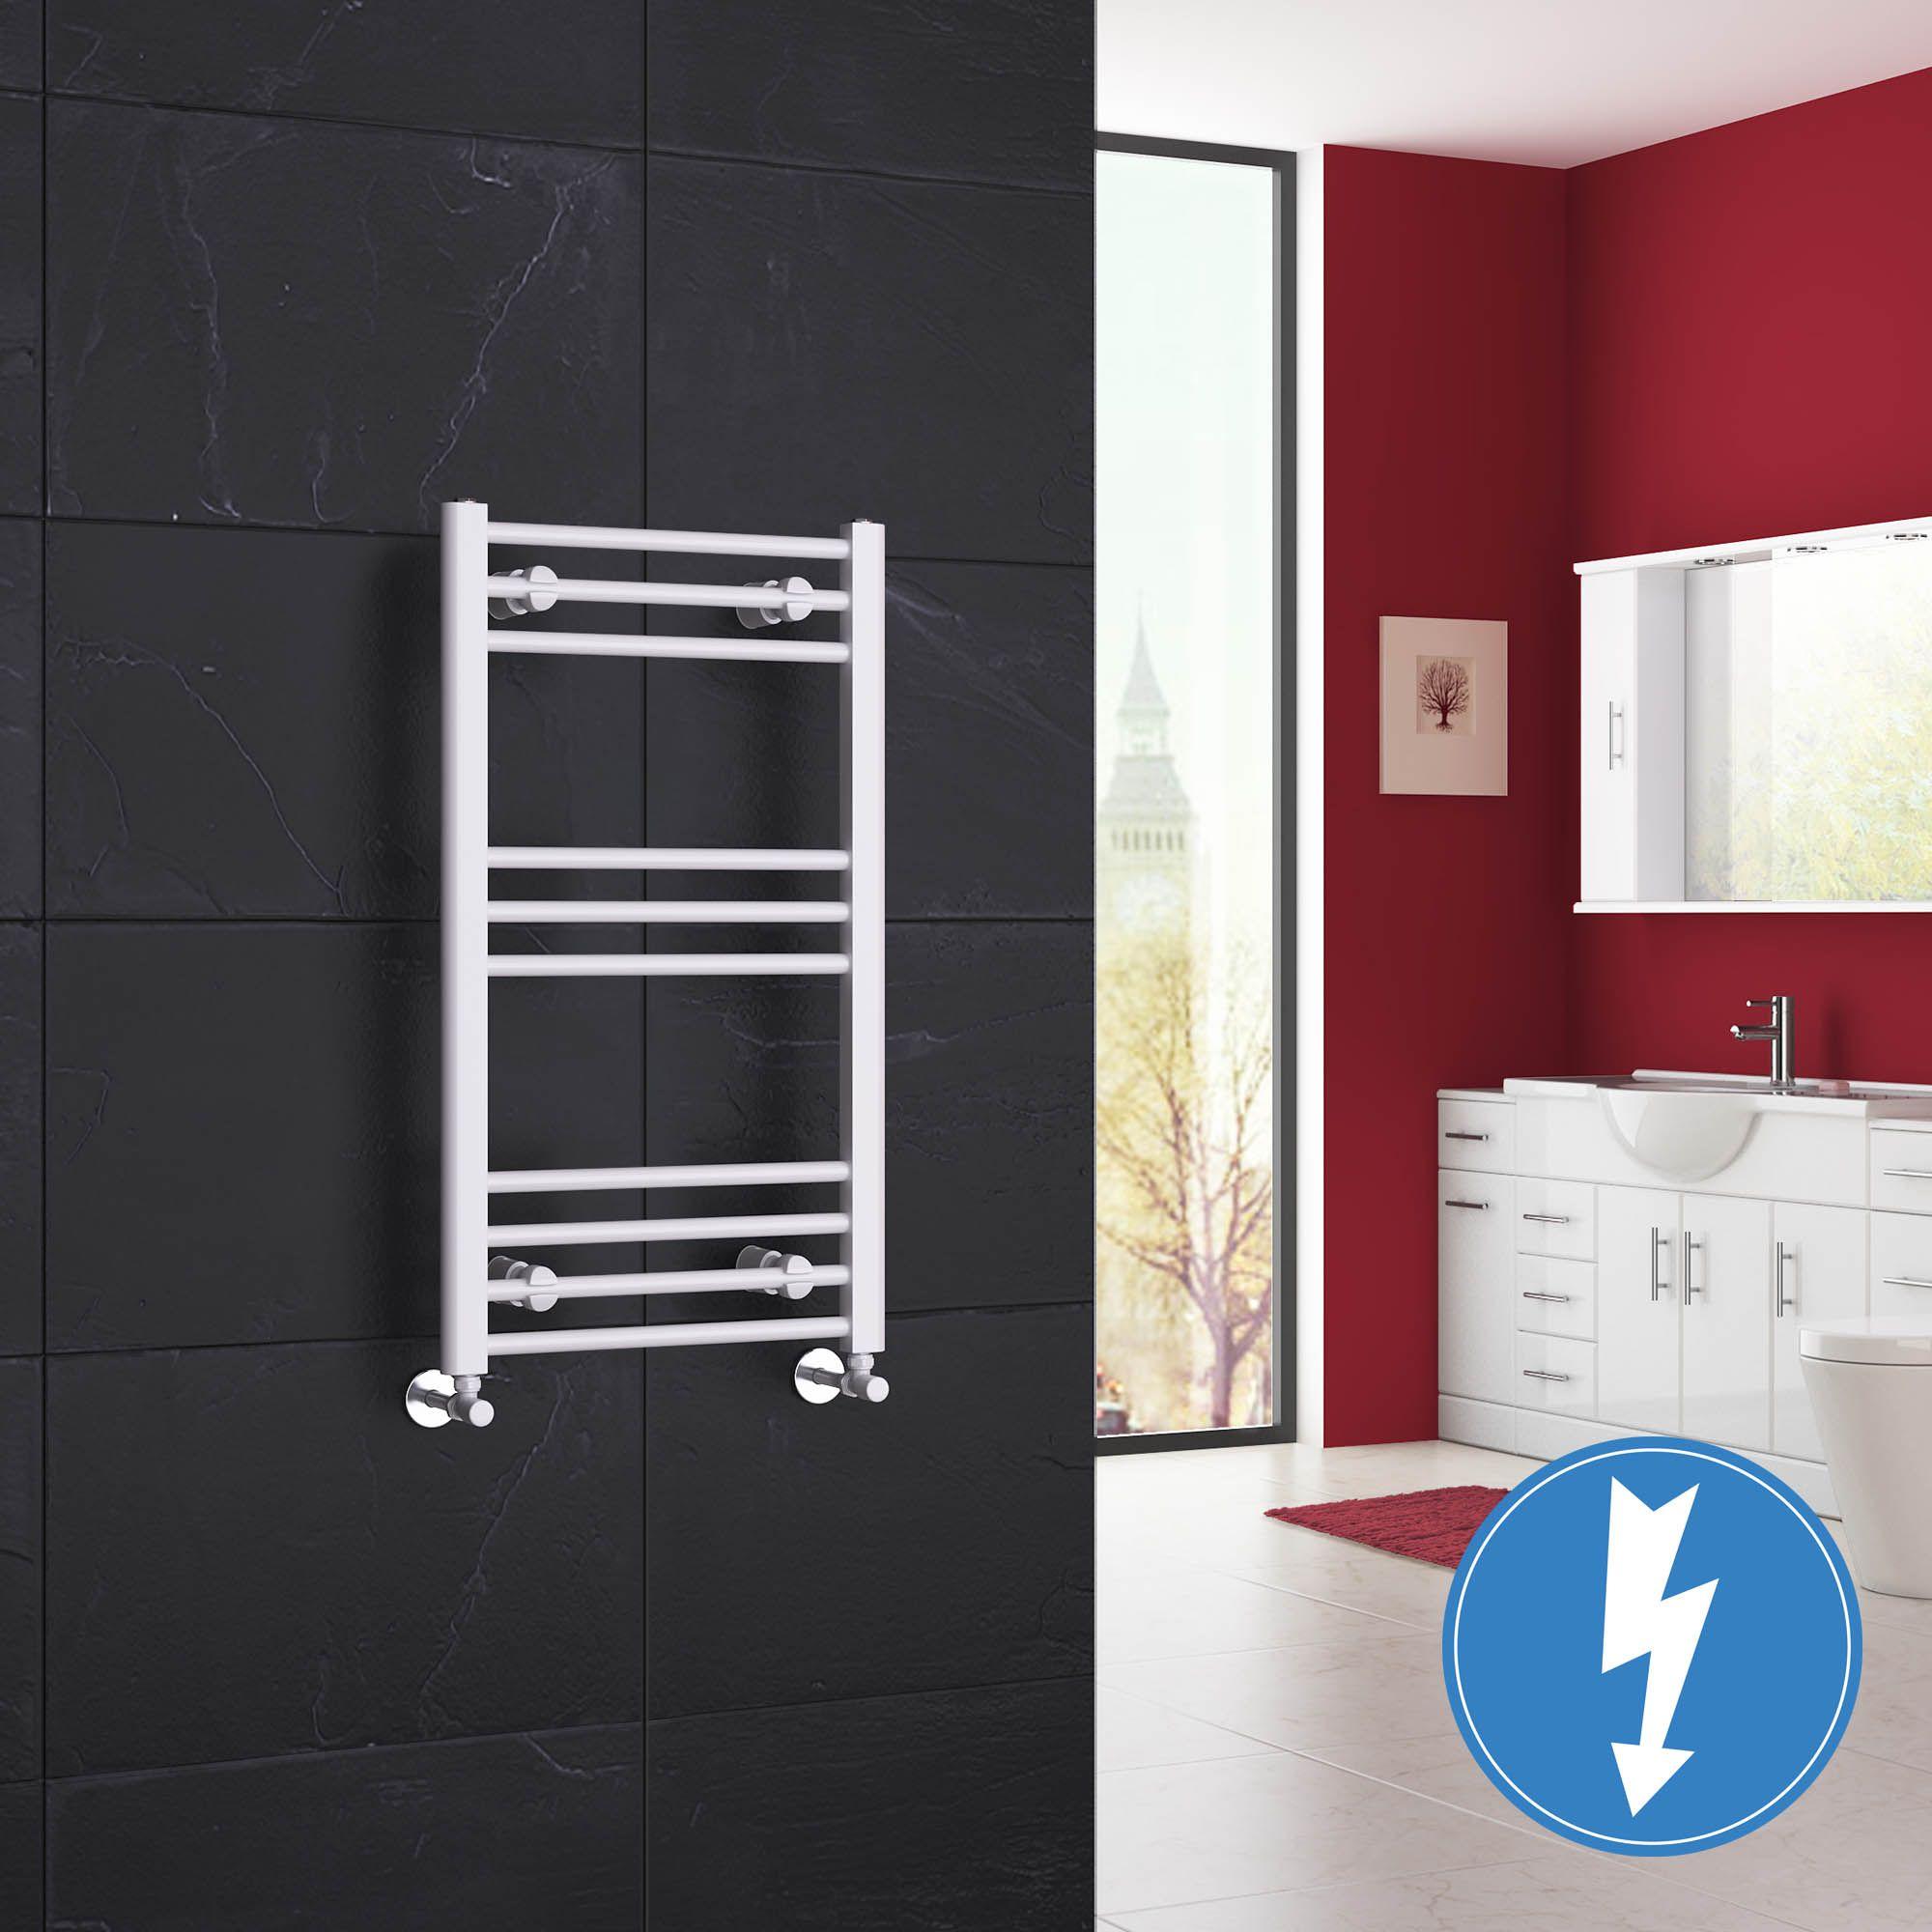 Natasha ladder rail straight modern electric towel radiator in chrome - Ladder Rail Straight Modern Electric Towel Radiator In White 800mm X 450mm